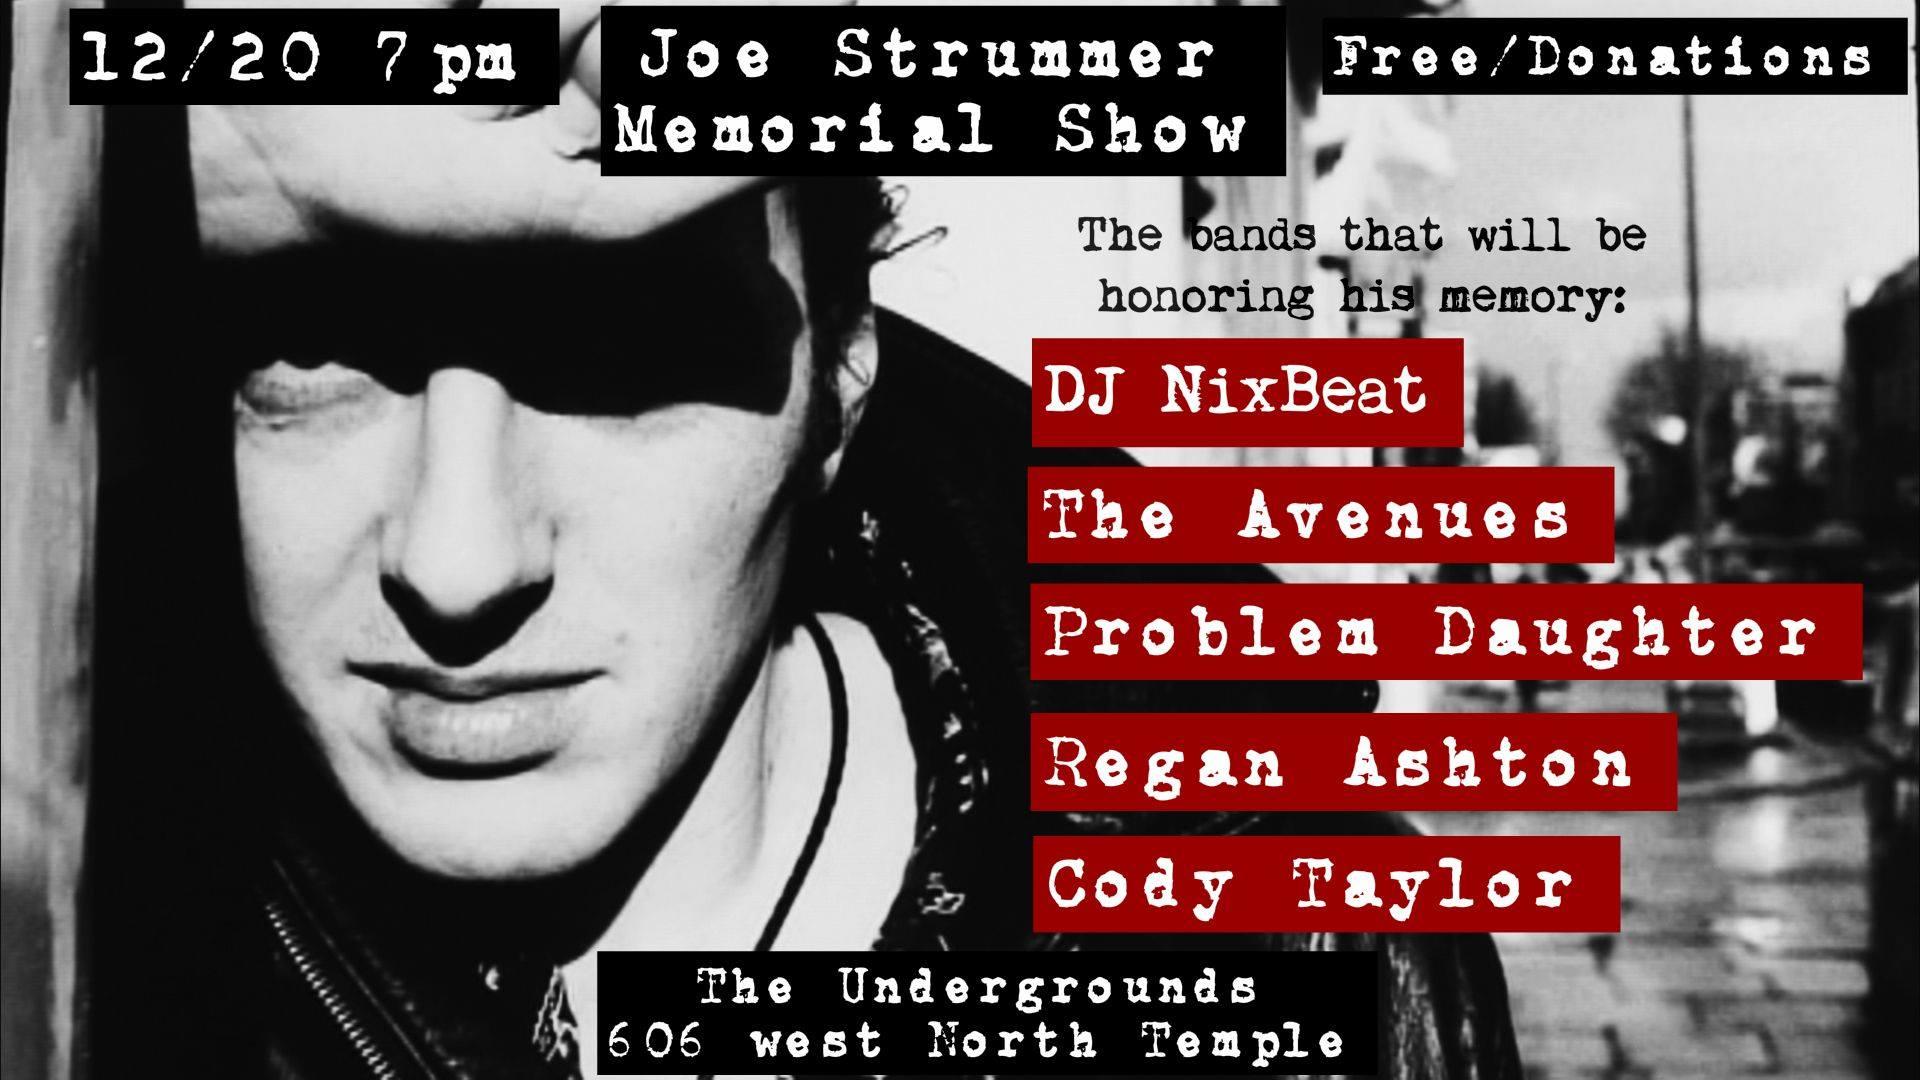 Joe Strummer Memorial Show